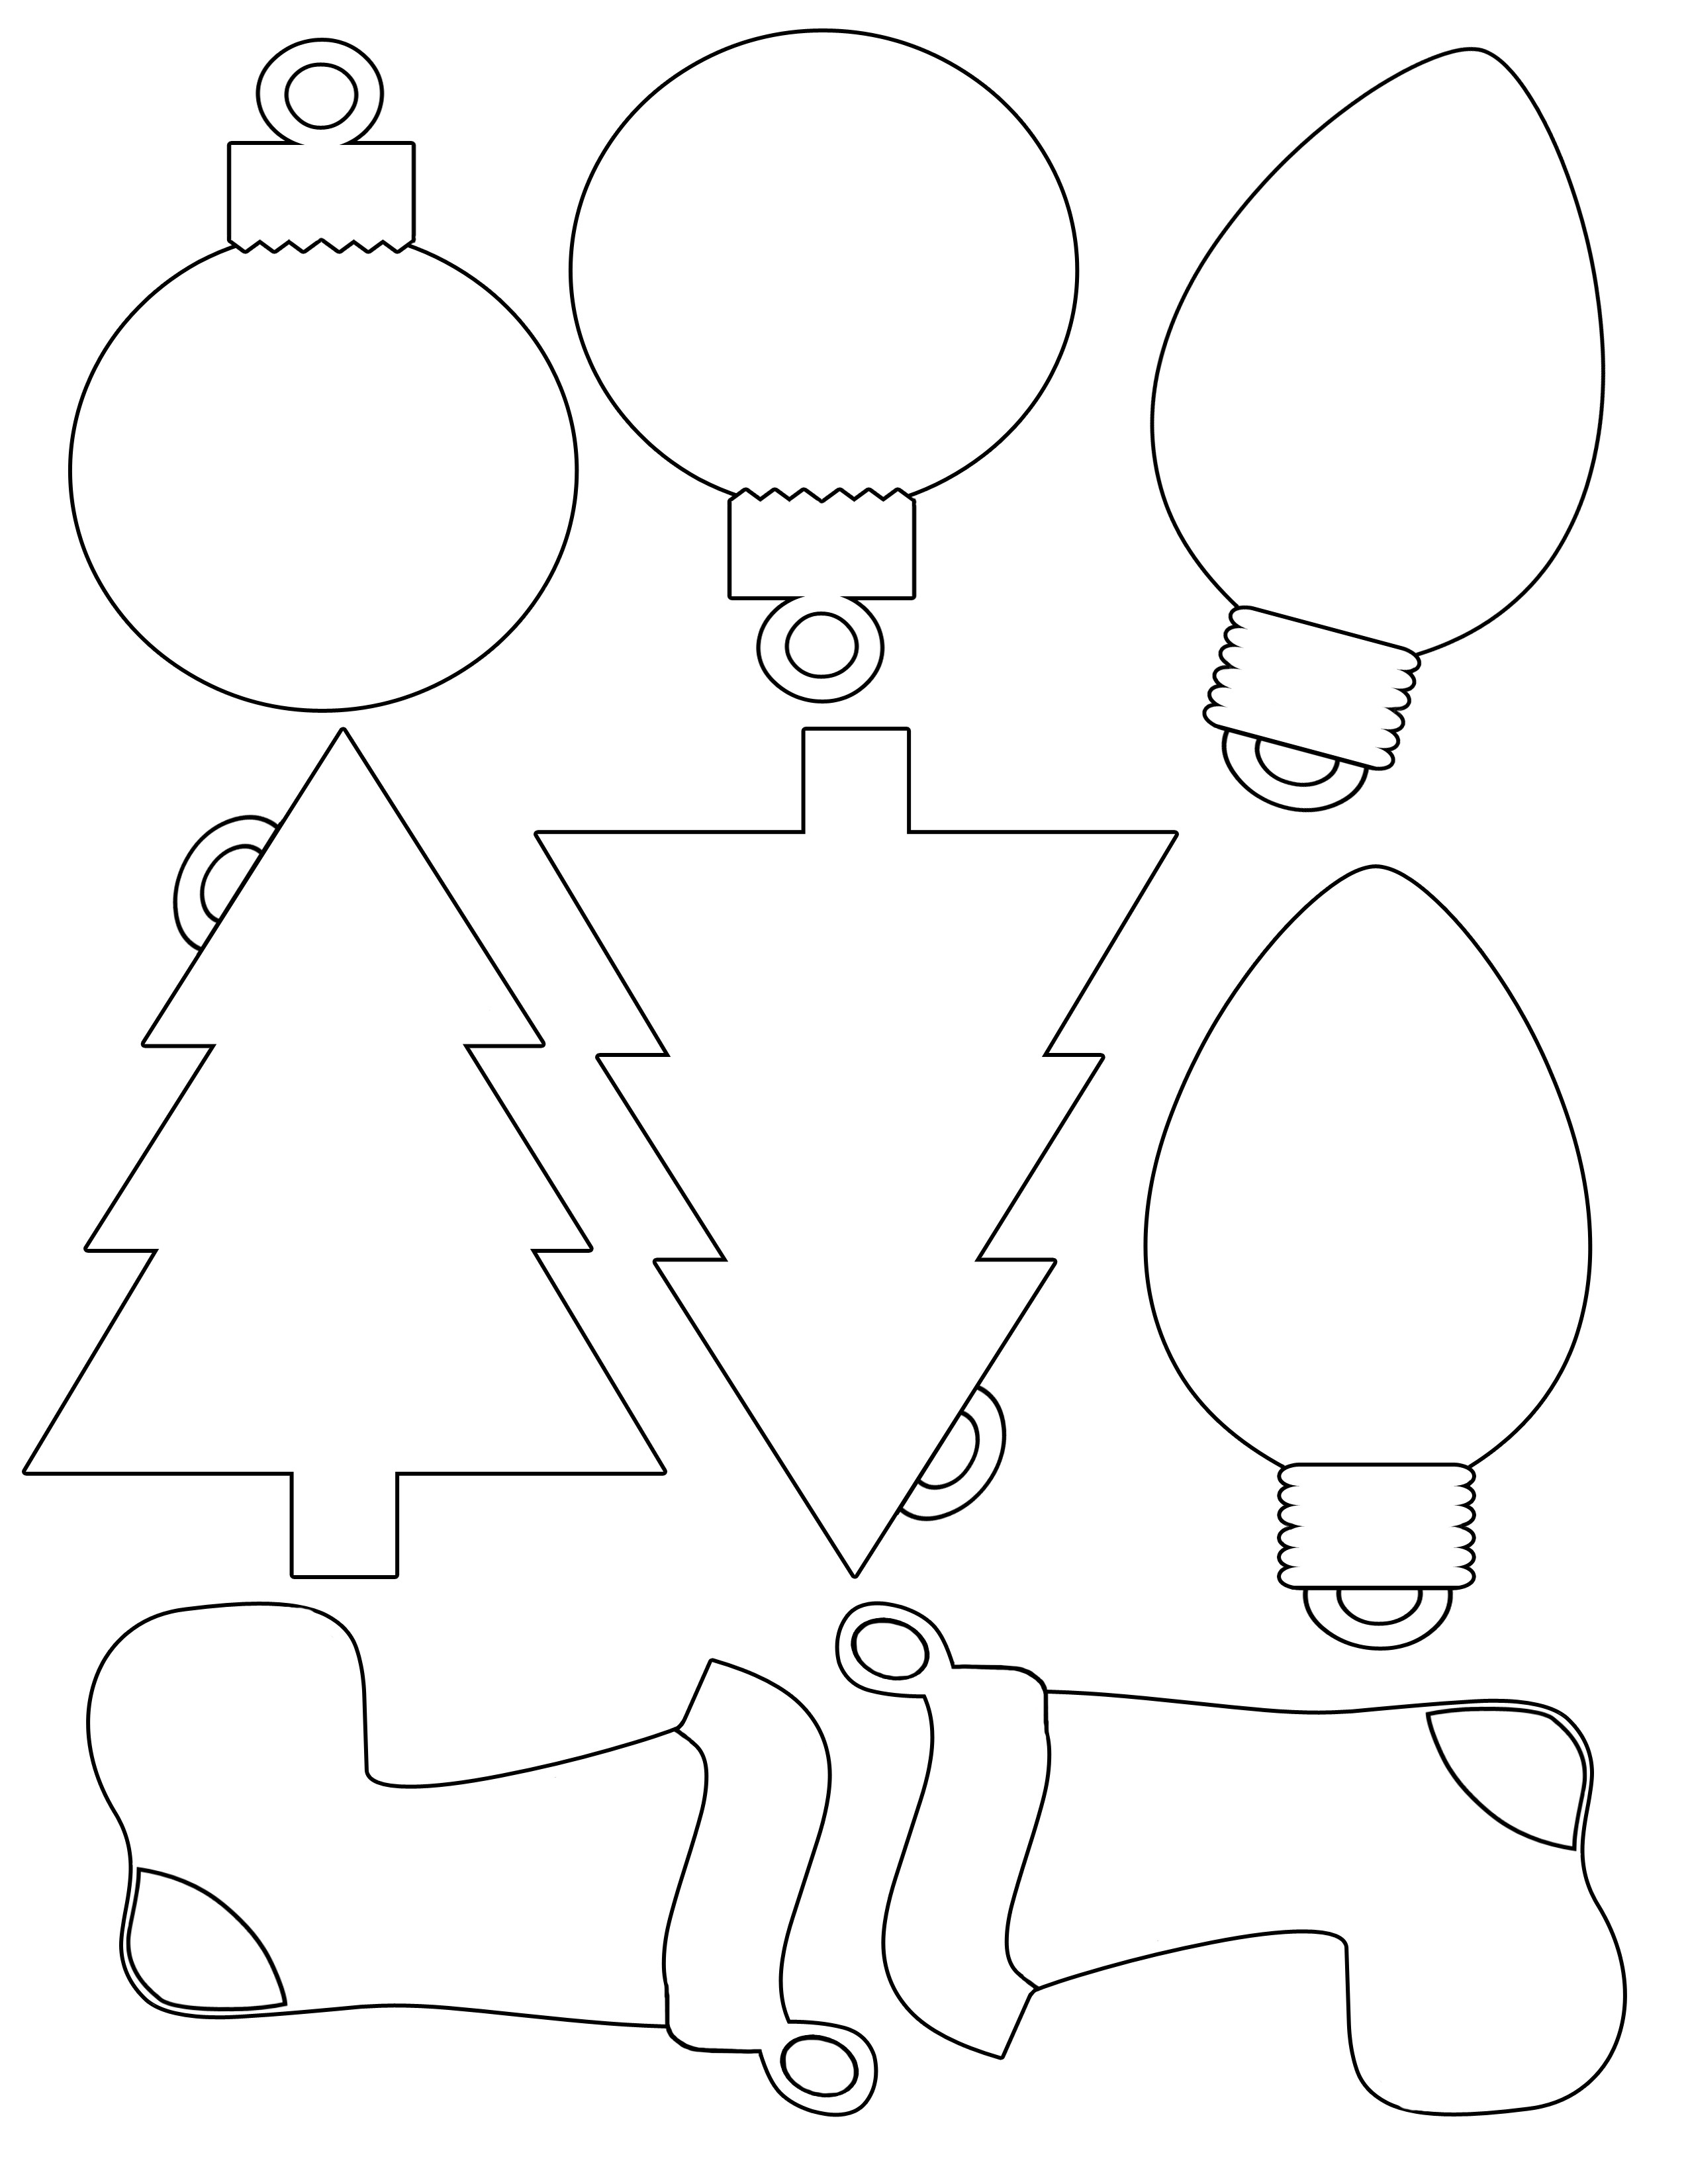 Christmas Ornament Stencils Printable – Festival Collections - Free Printable Christmas Ornaments Stencils